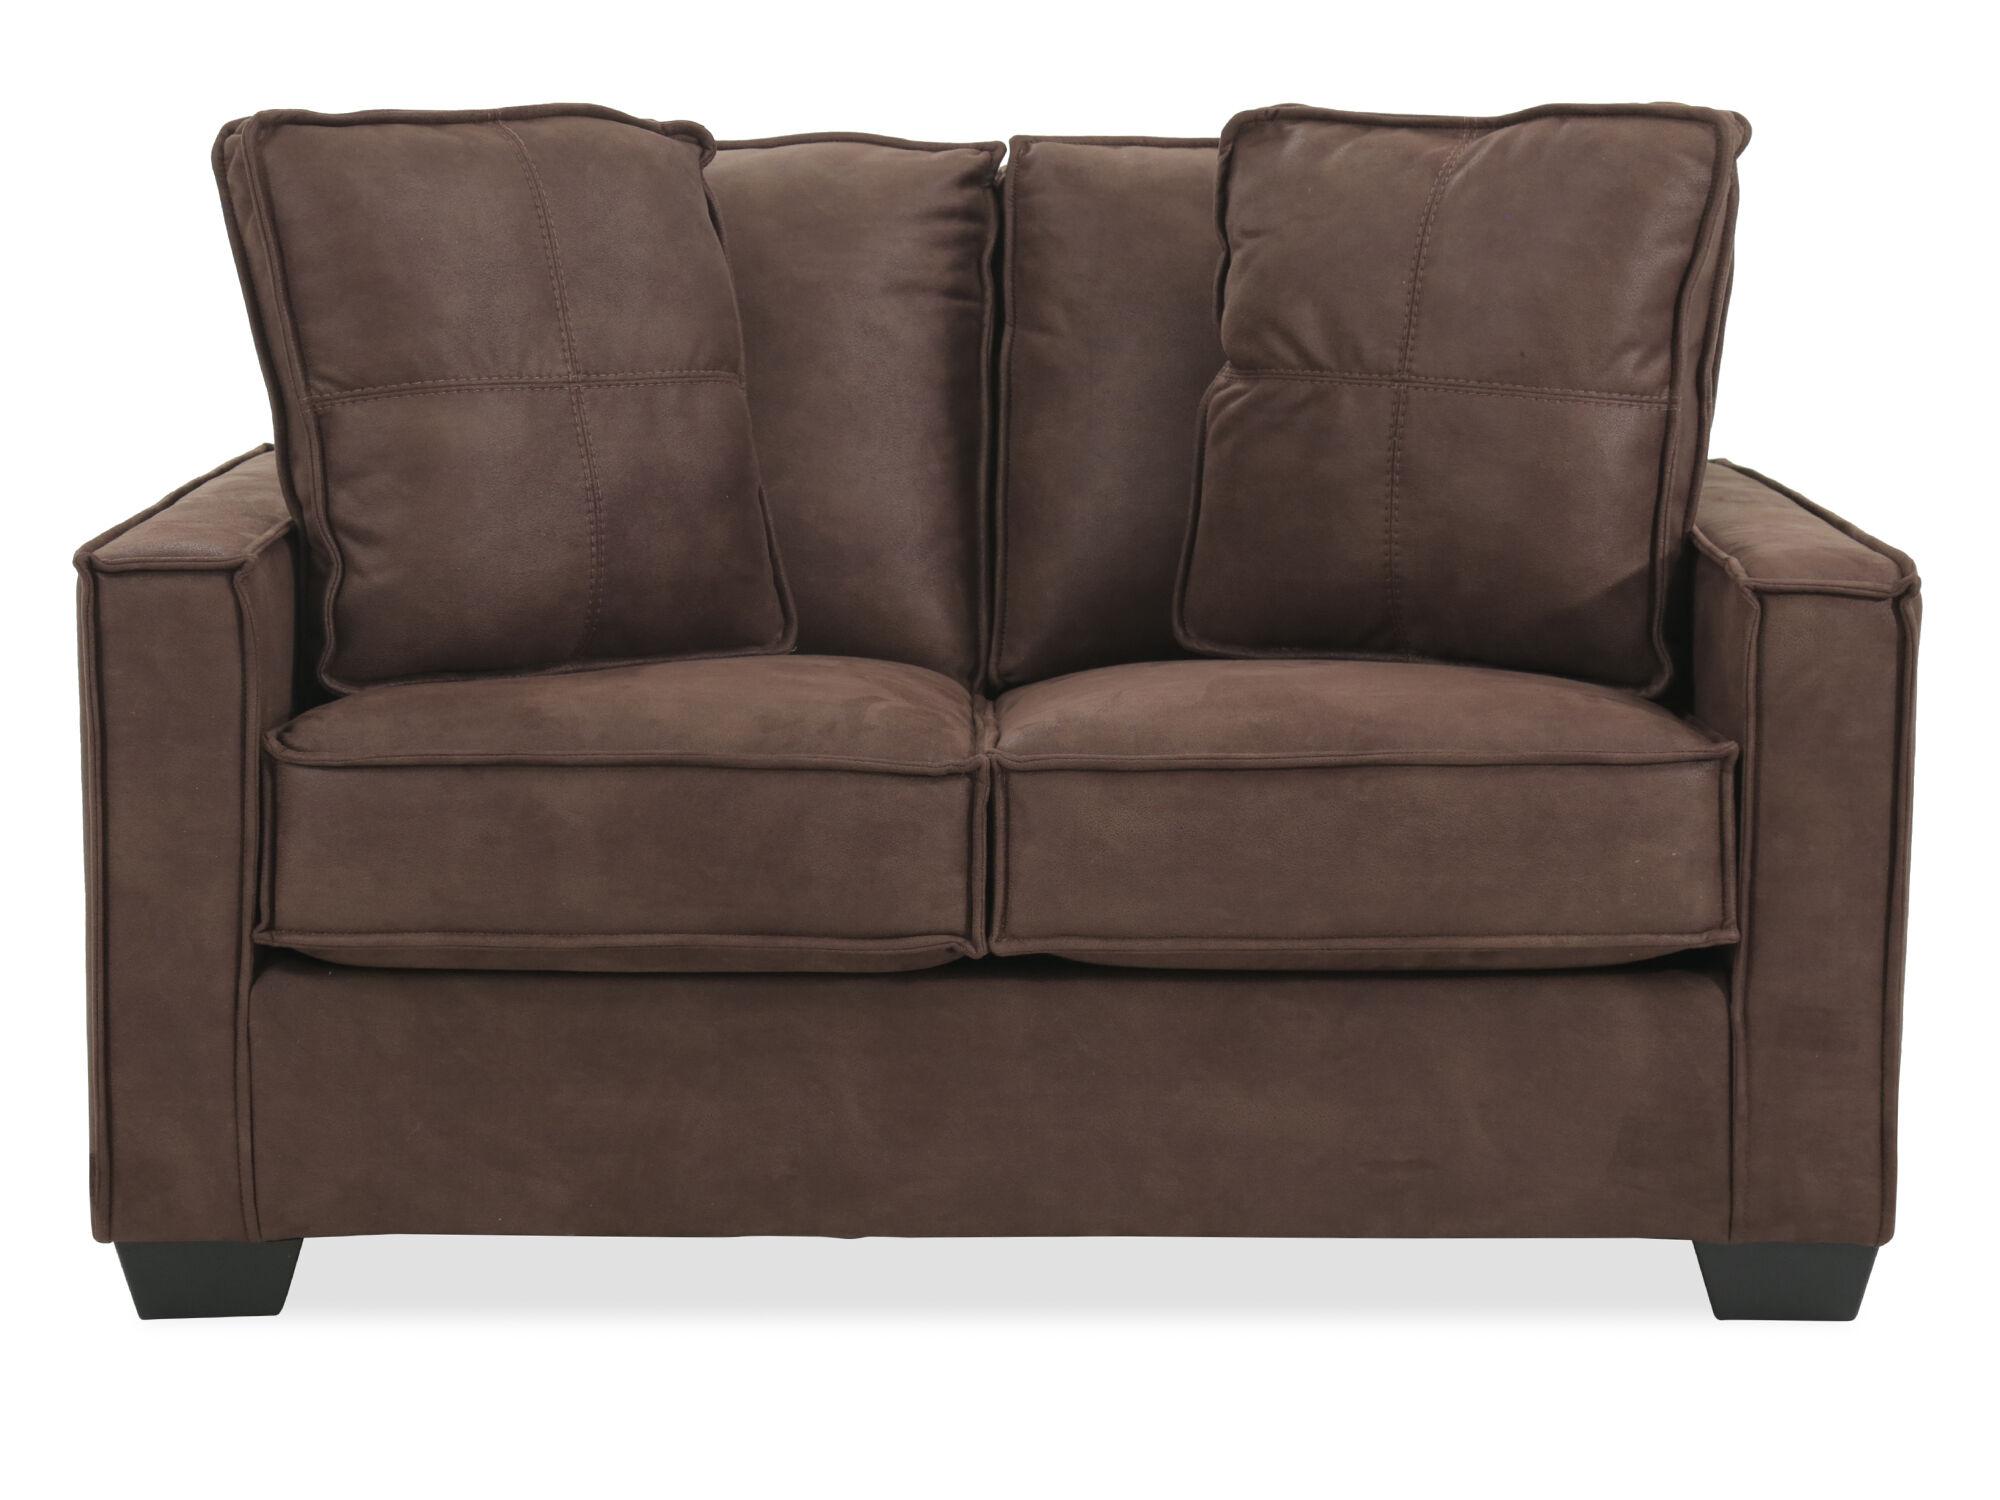 lauren ashley 60 zero wall sofa recliner modern beige sectional furniture piecrust welted contemporary quot loveseat in brown